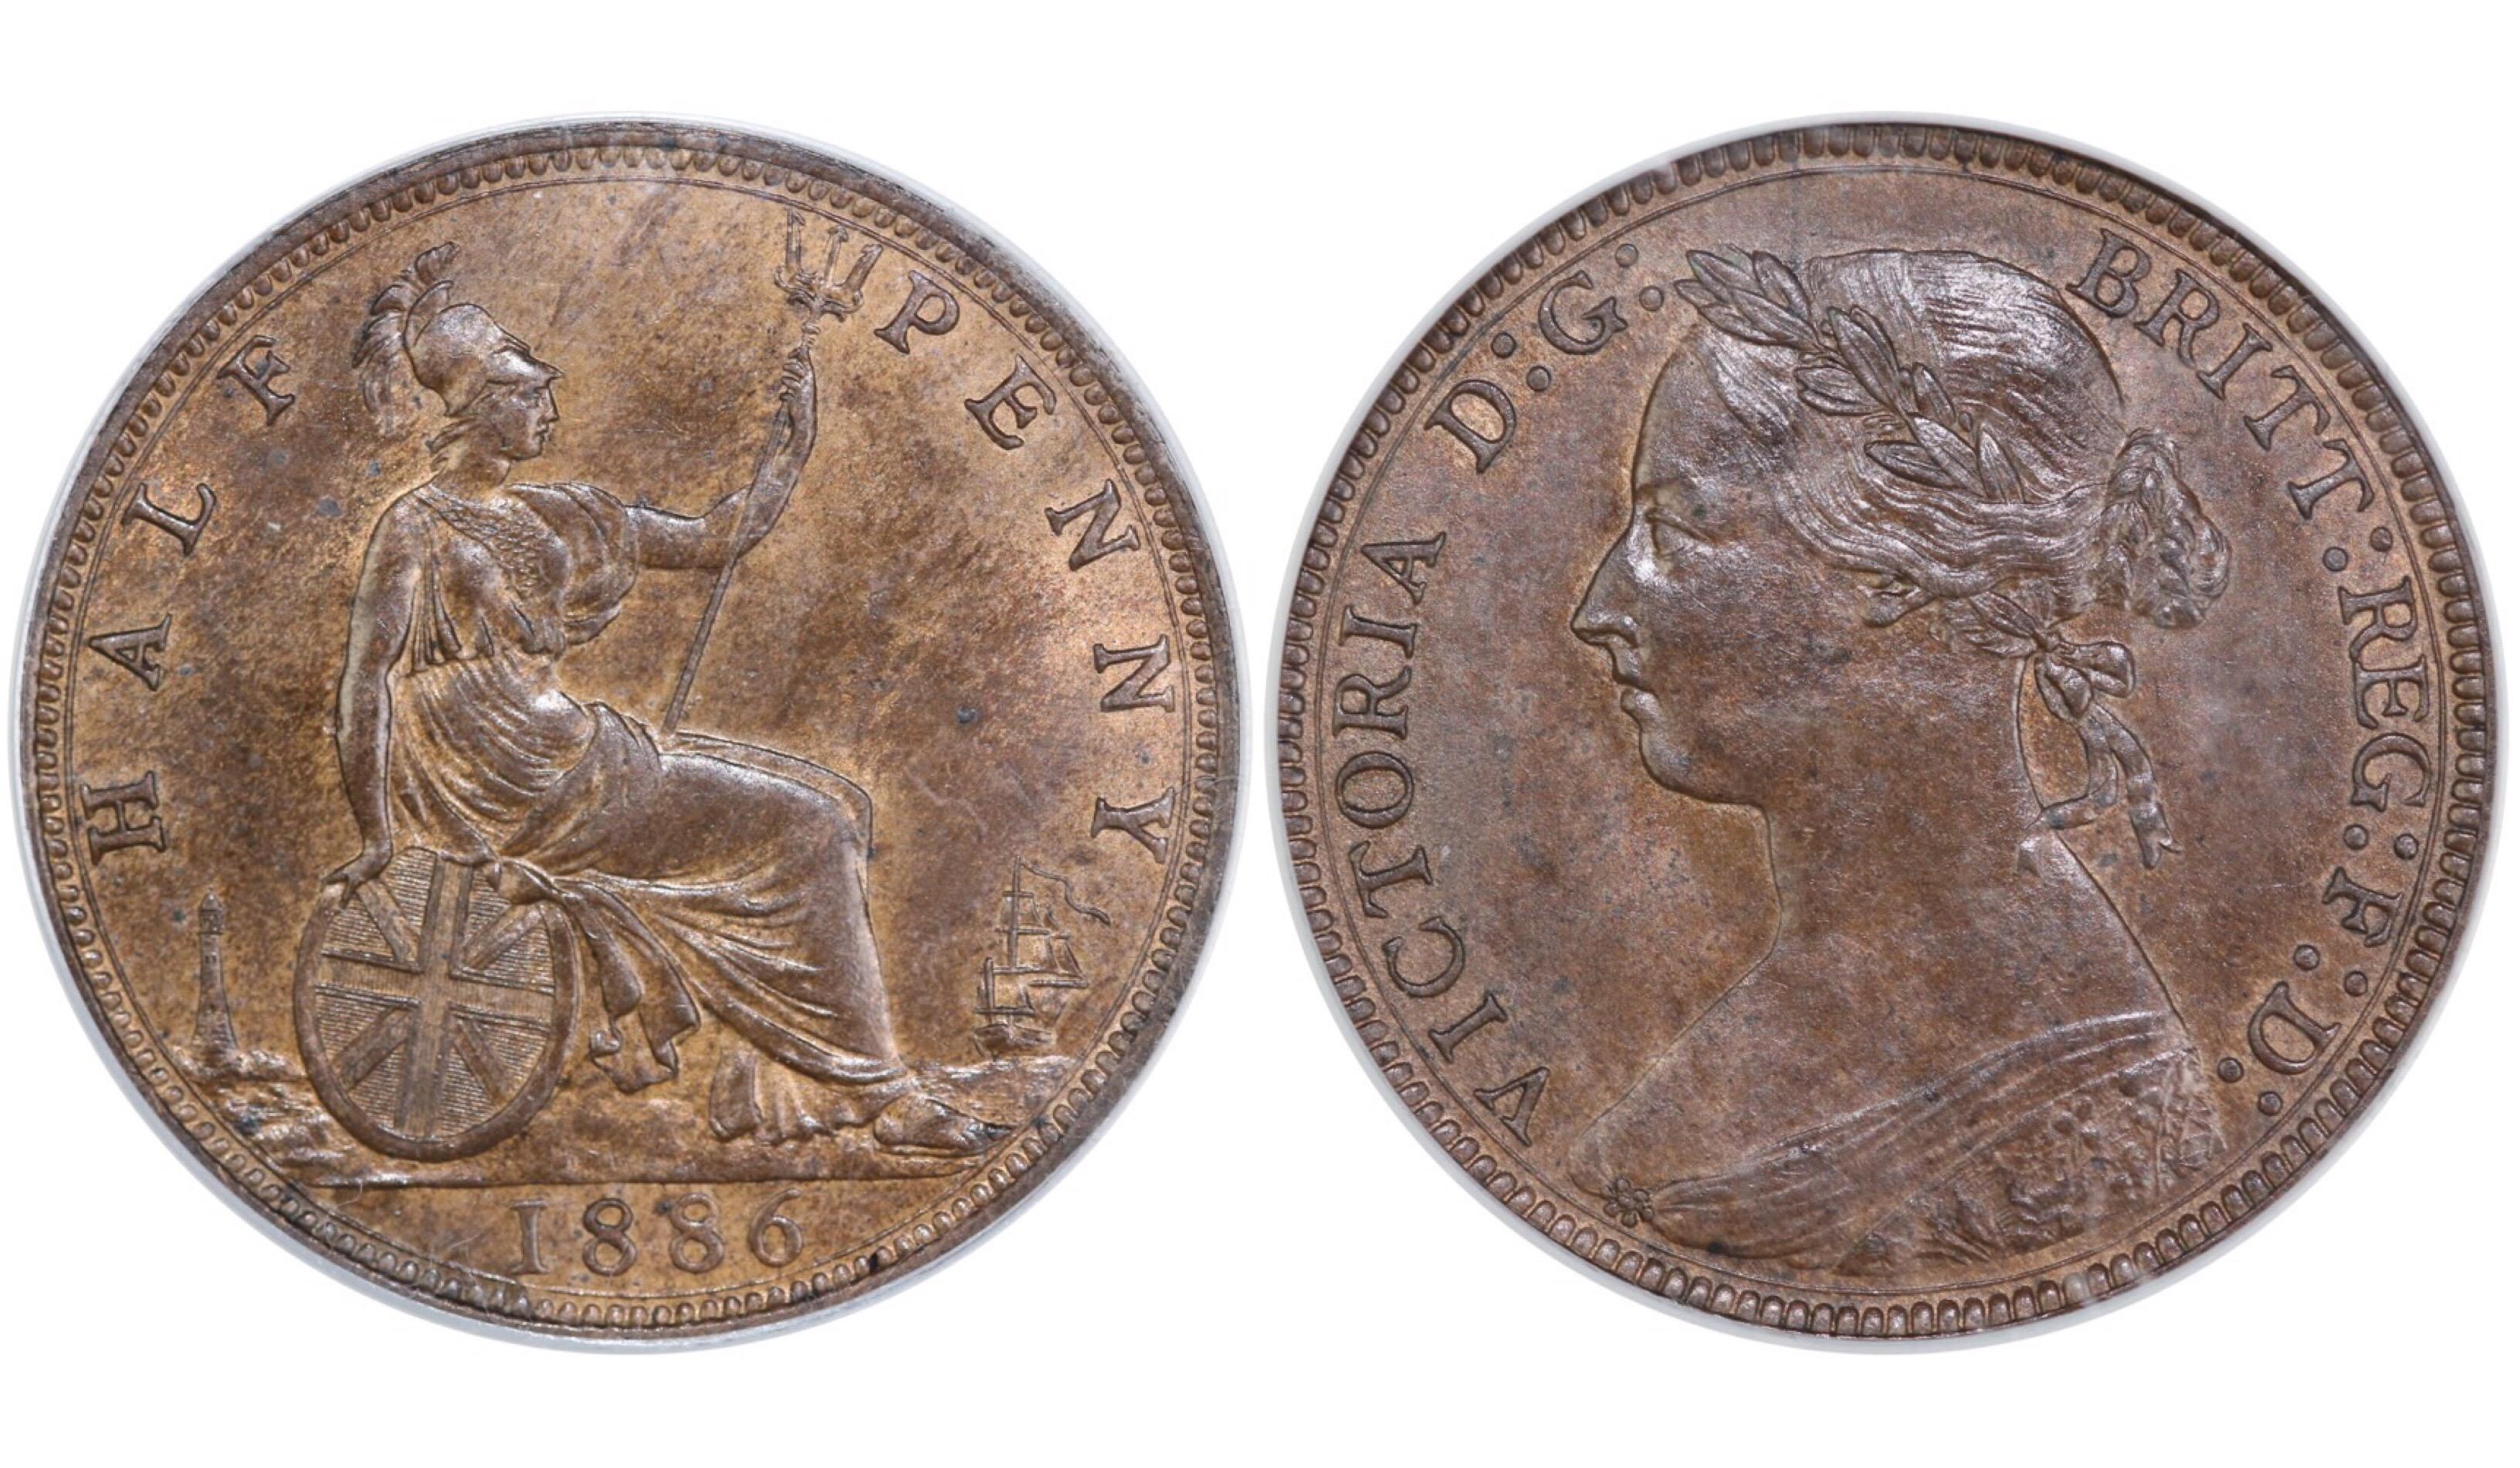 1886 Halfpenny, CGS 78, Victoria, Freeman 356, UIN 37290